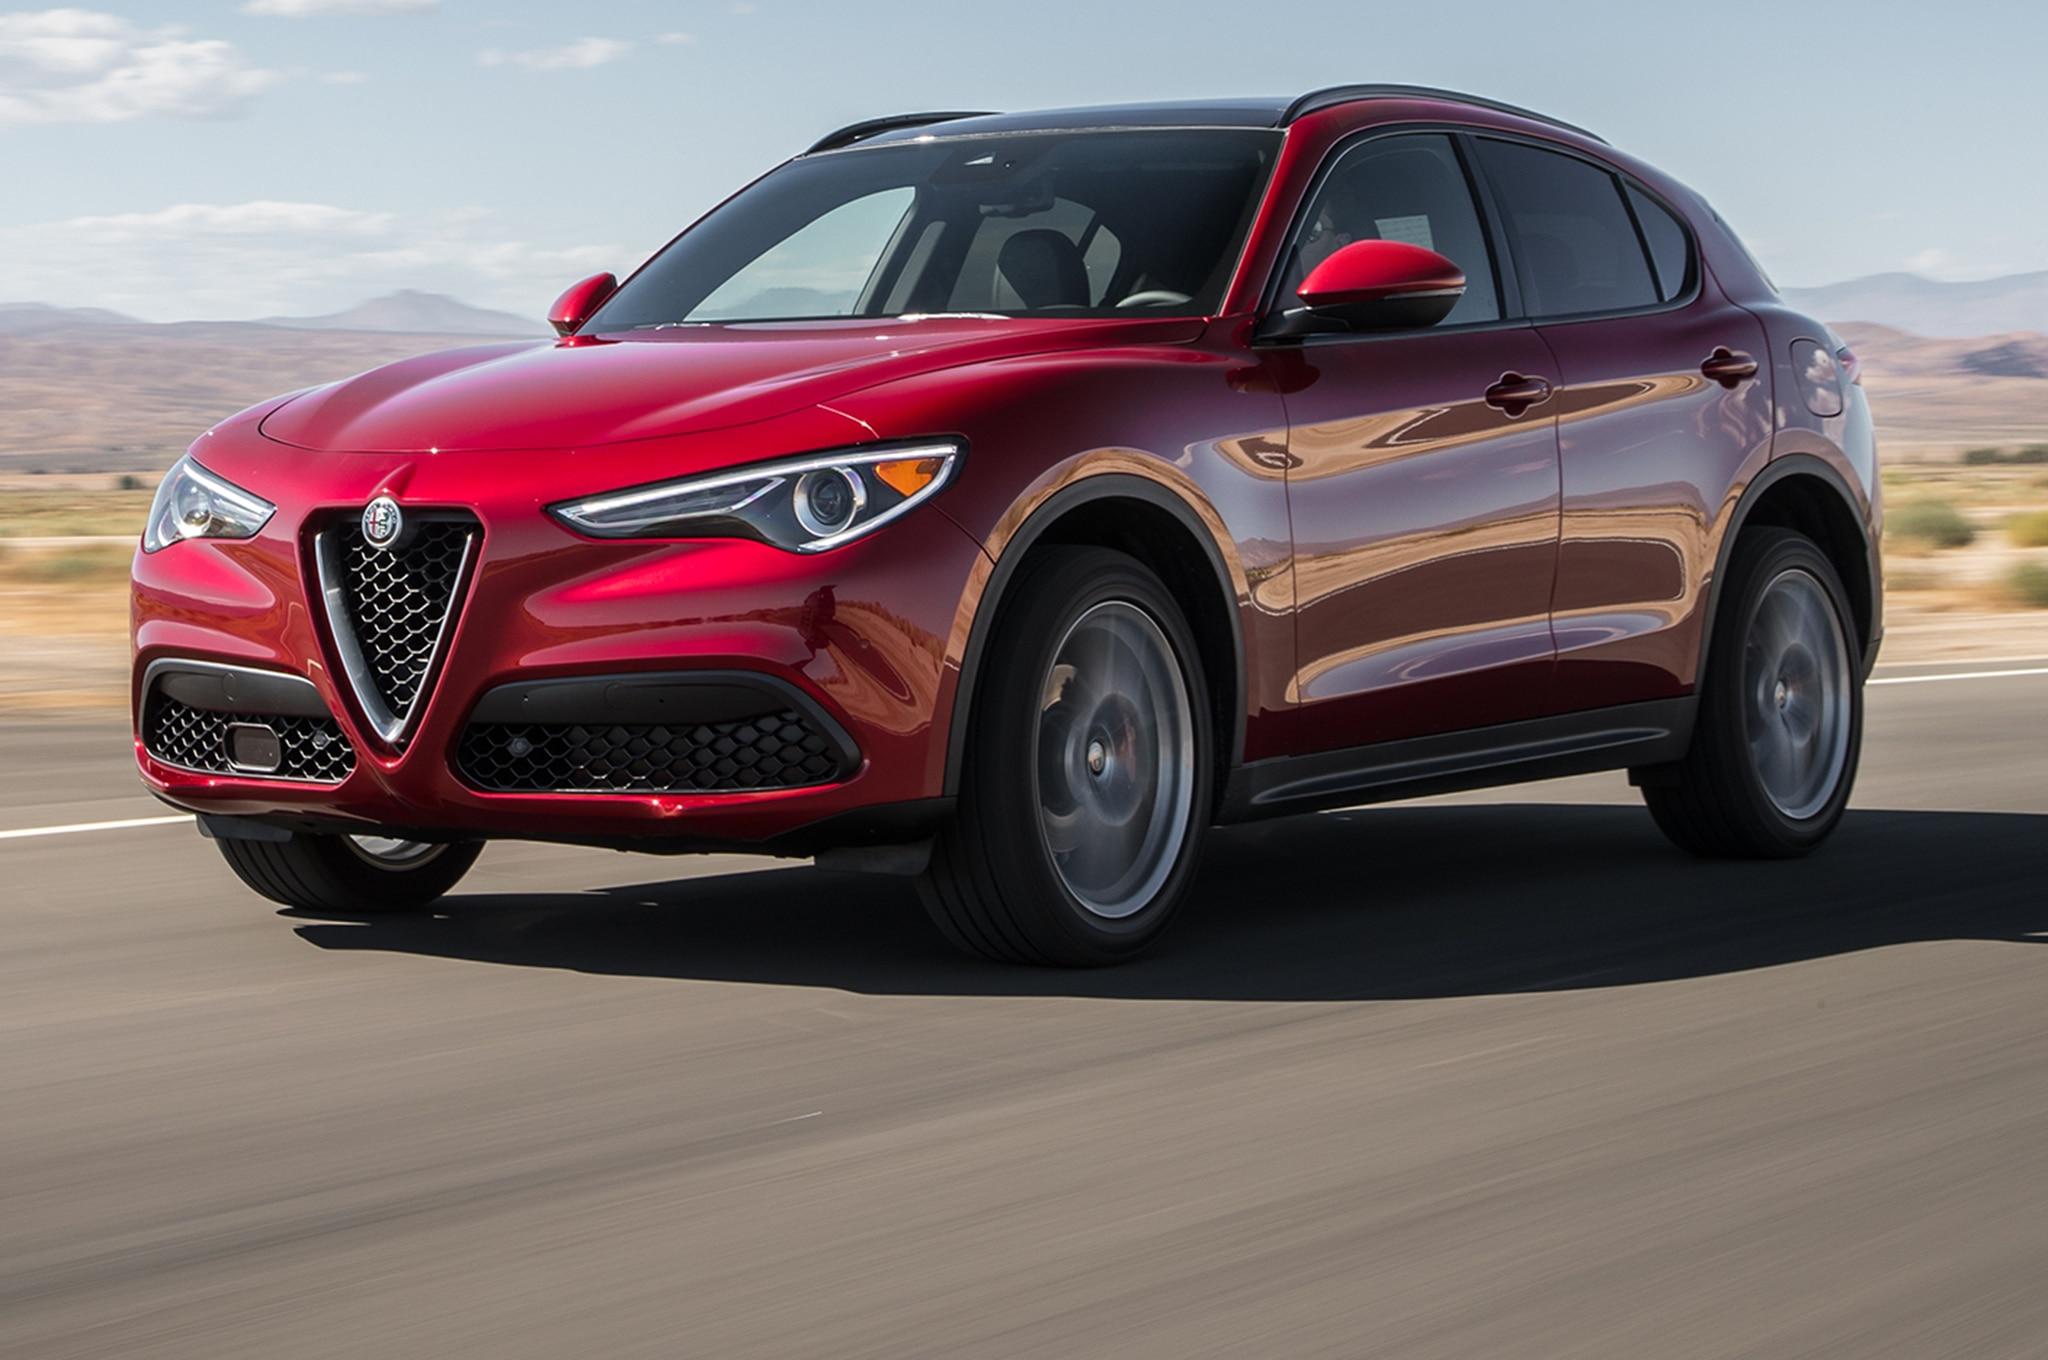 2018 Alfa Romeo Stelvio Q4 Front Three Quarter In Motion 00